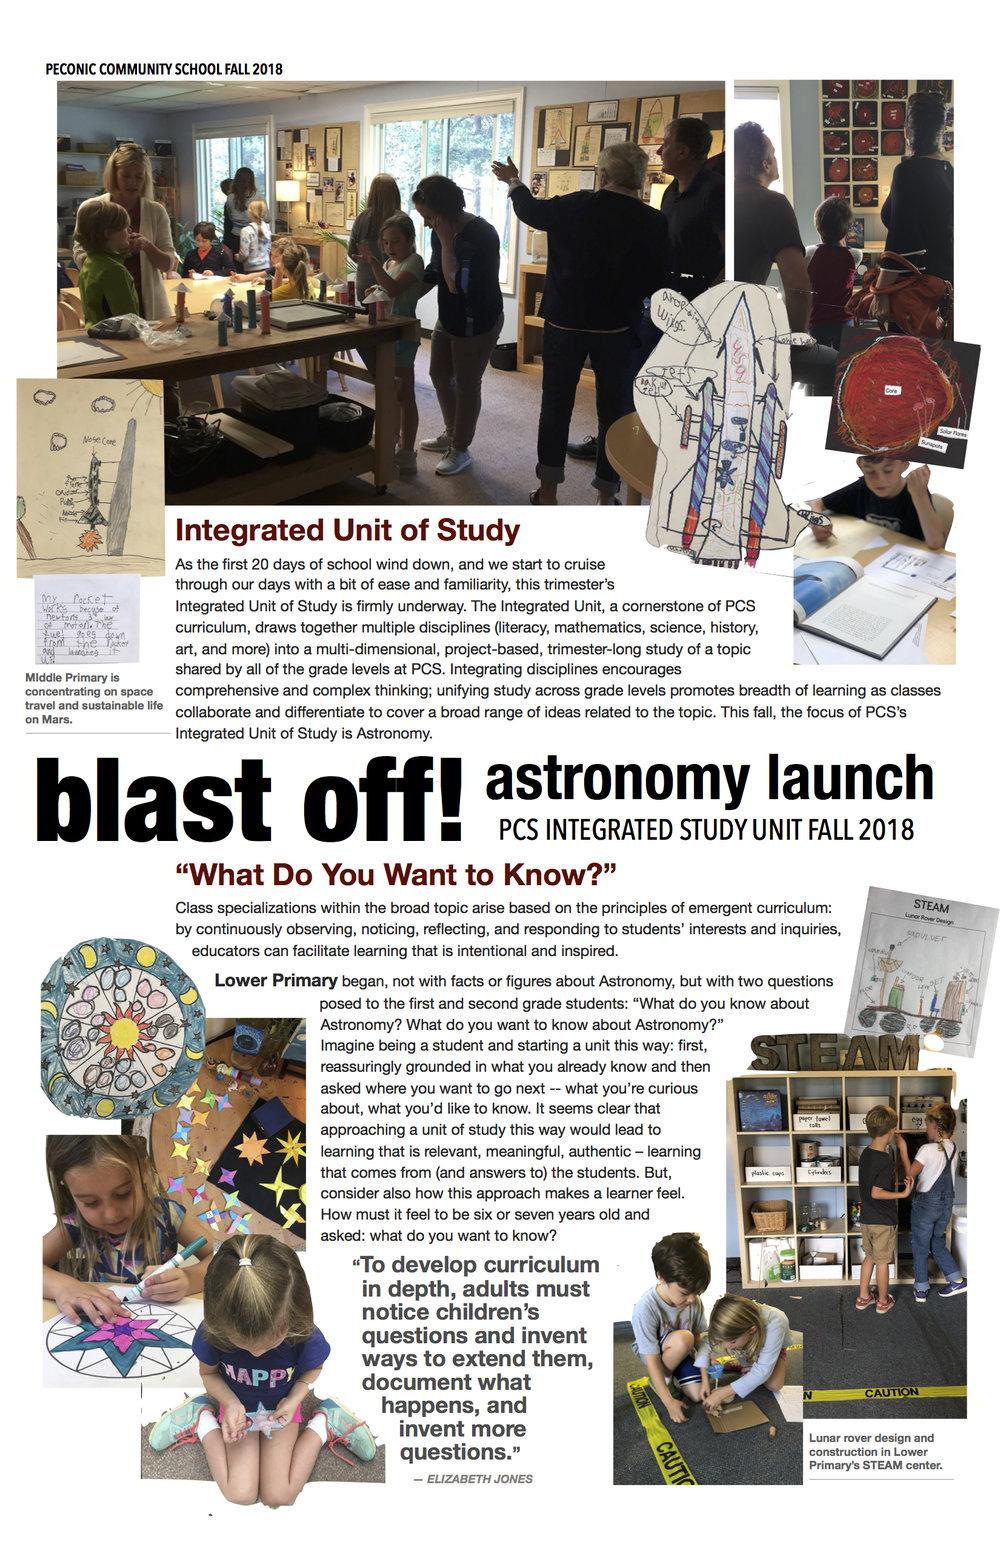 astonomy launch 2018-19 page 1 JPEG.jpg